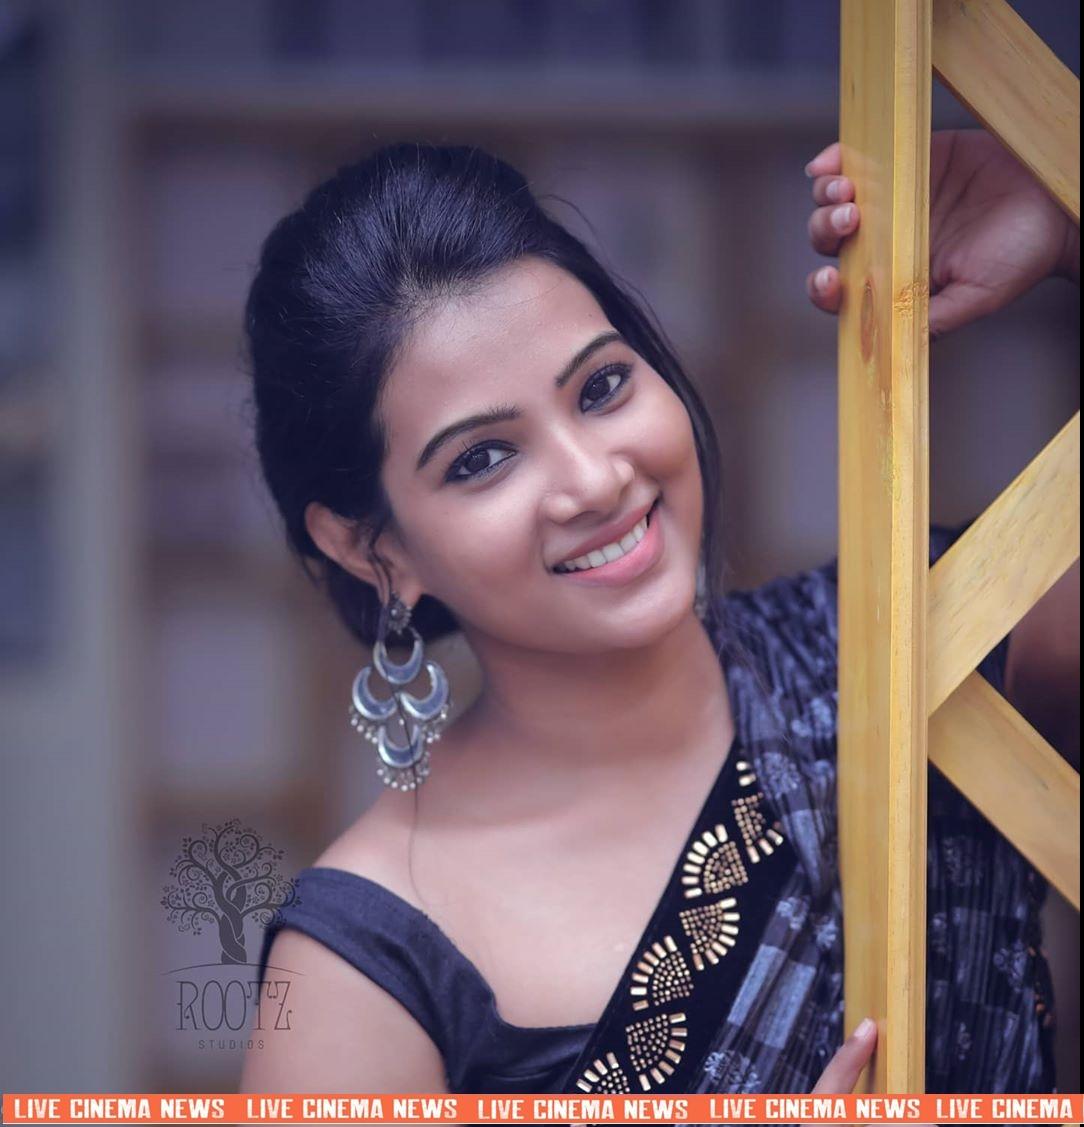 dhivya dhuraisamy homely saree photos (8)